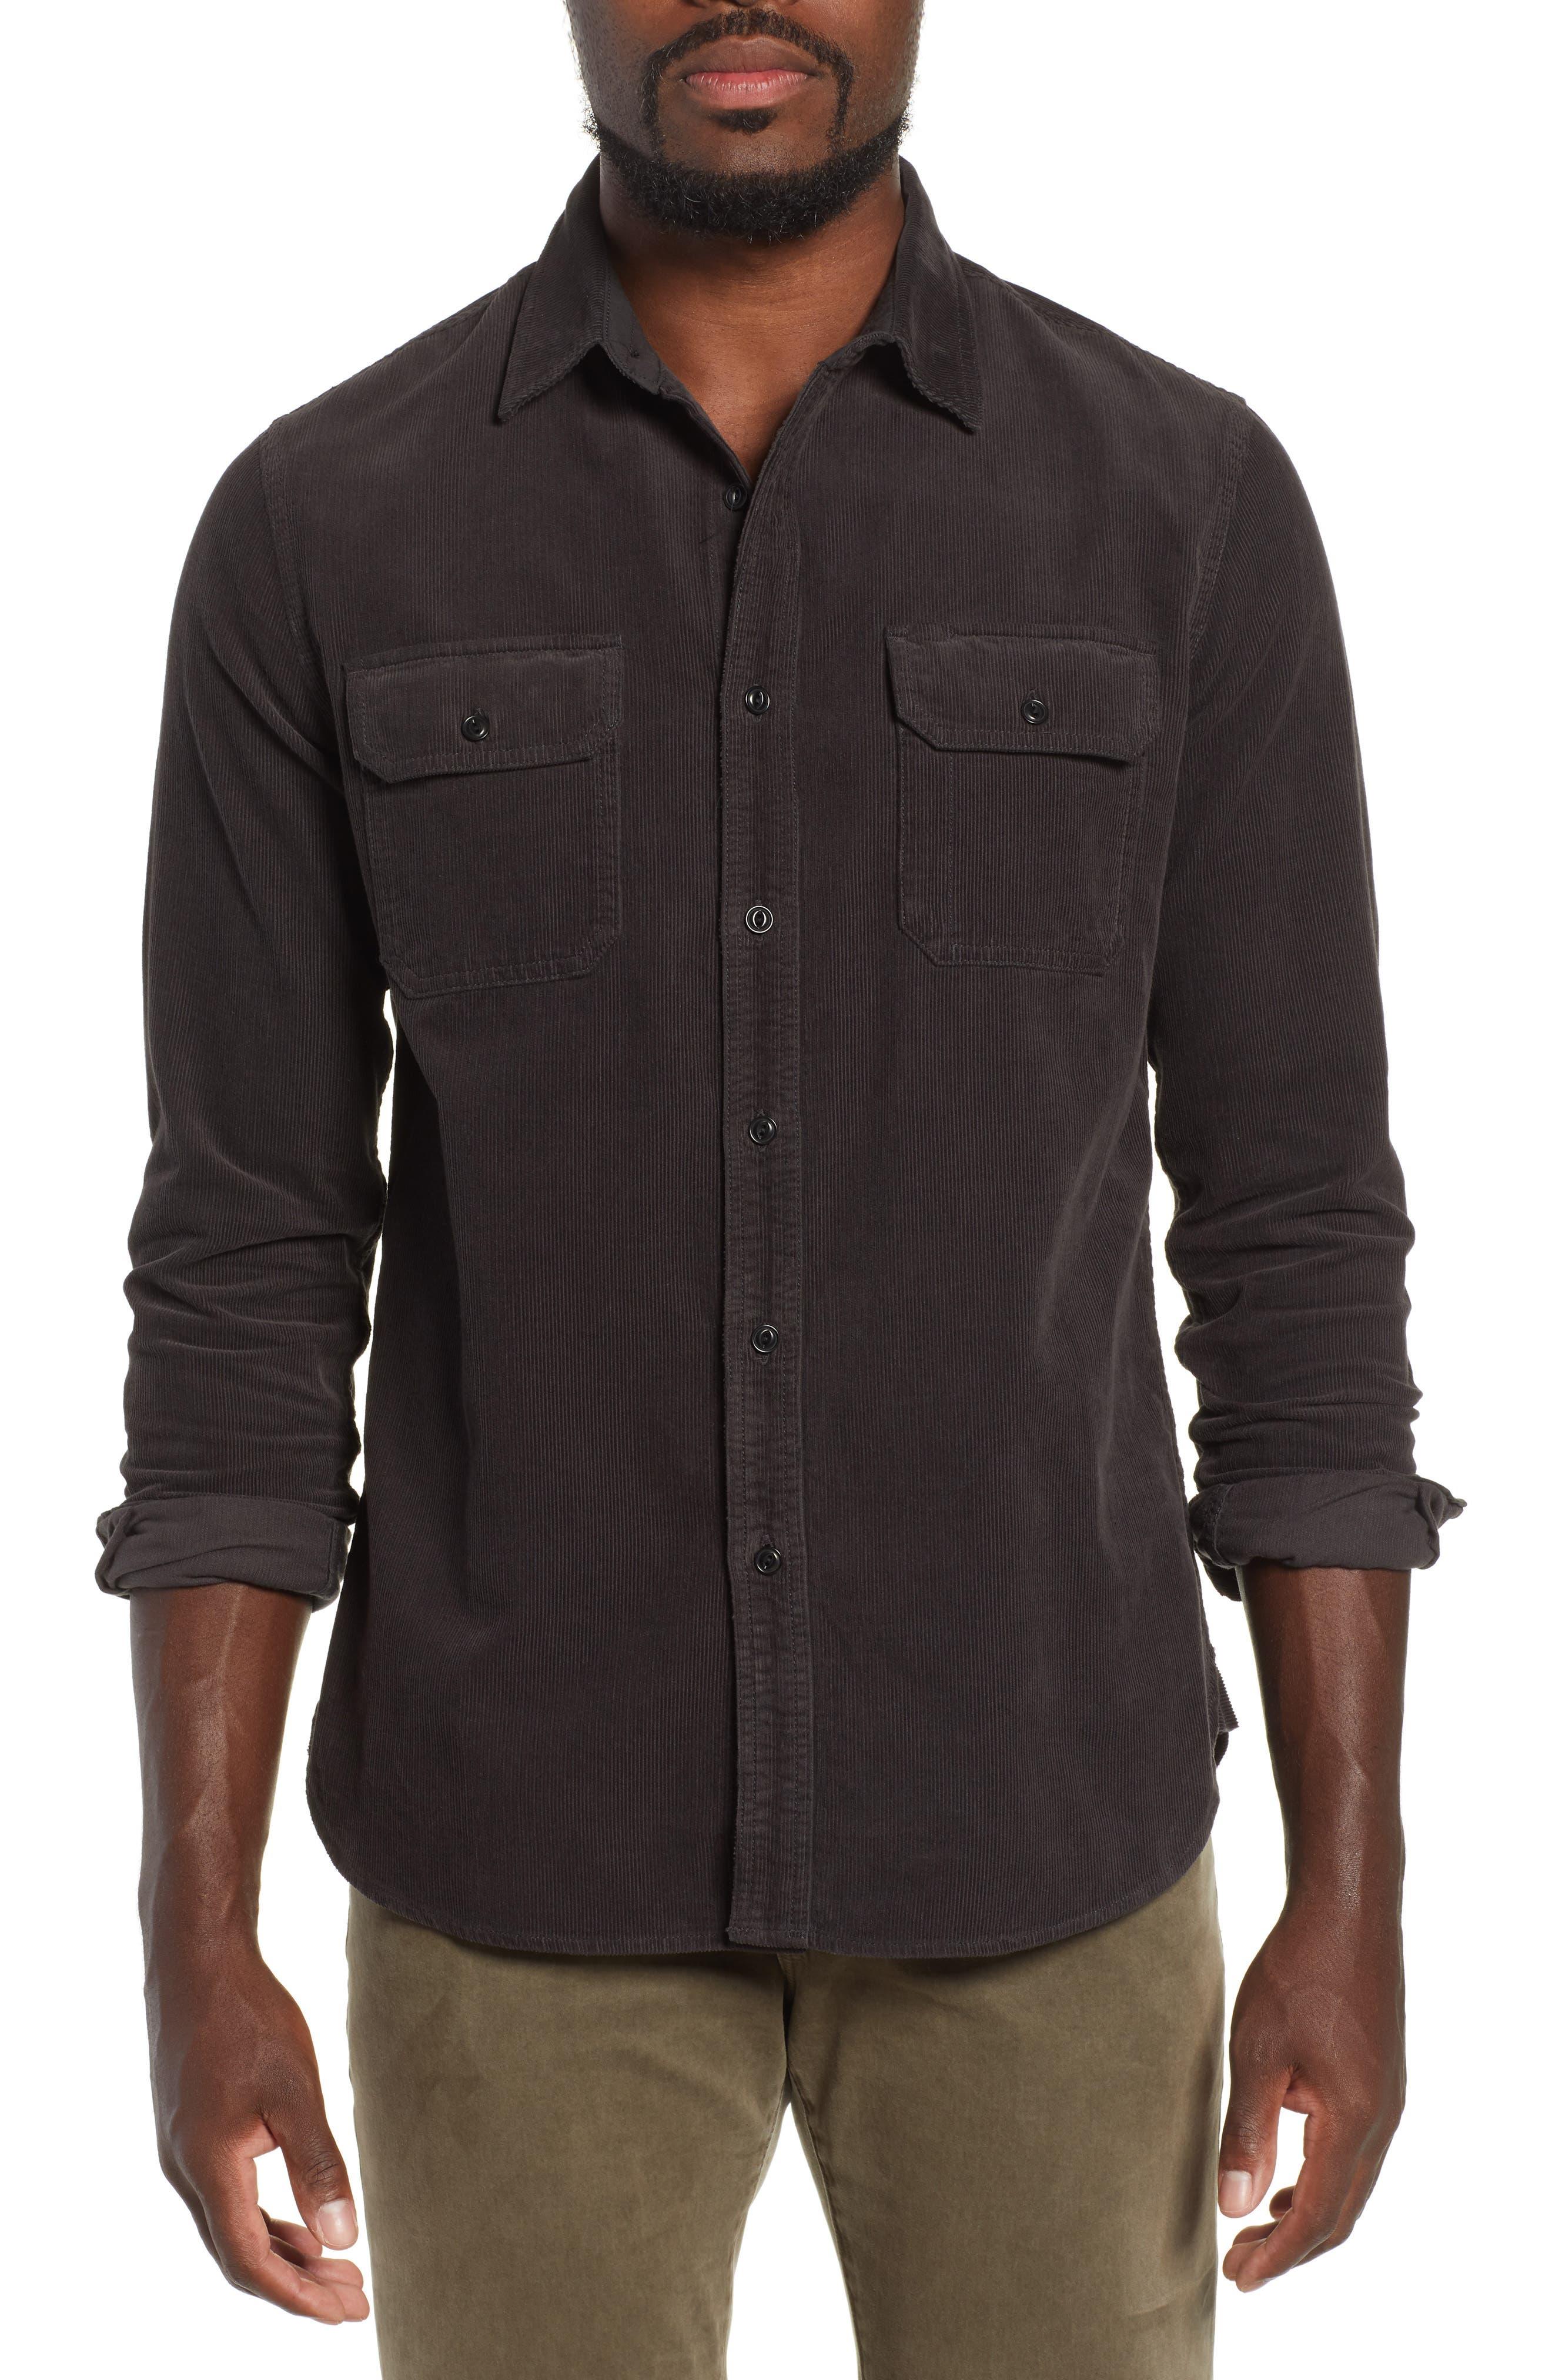 Benning Slim Fit Utility Shirt,                         Main,                         color, GRAY STONE